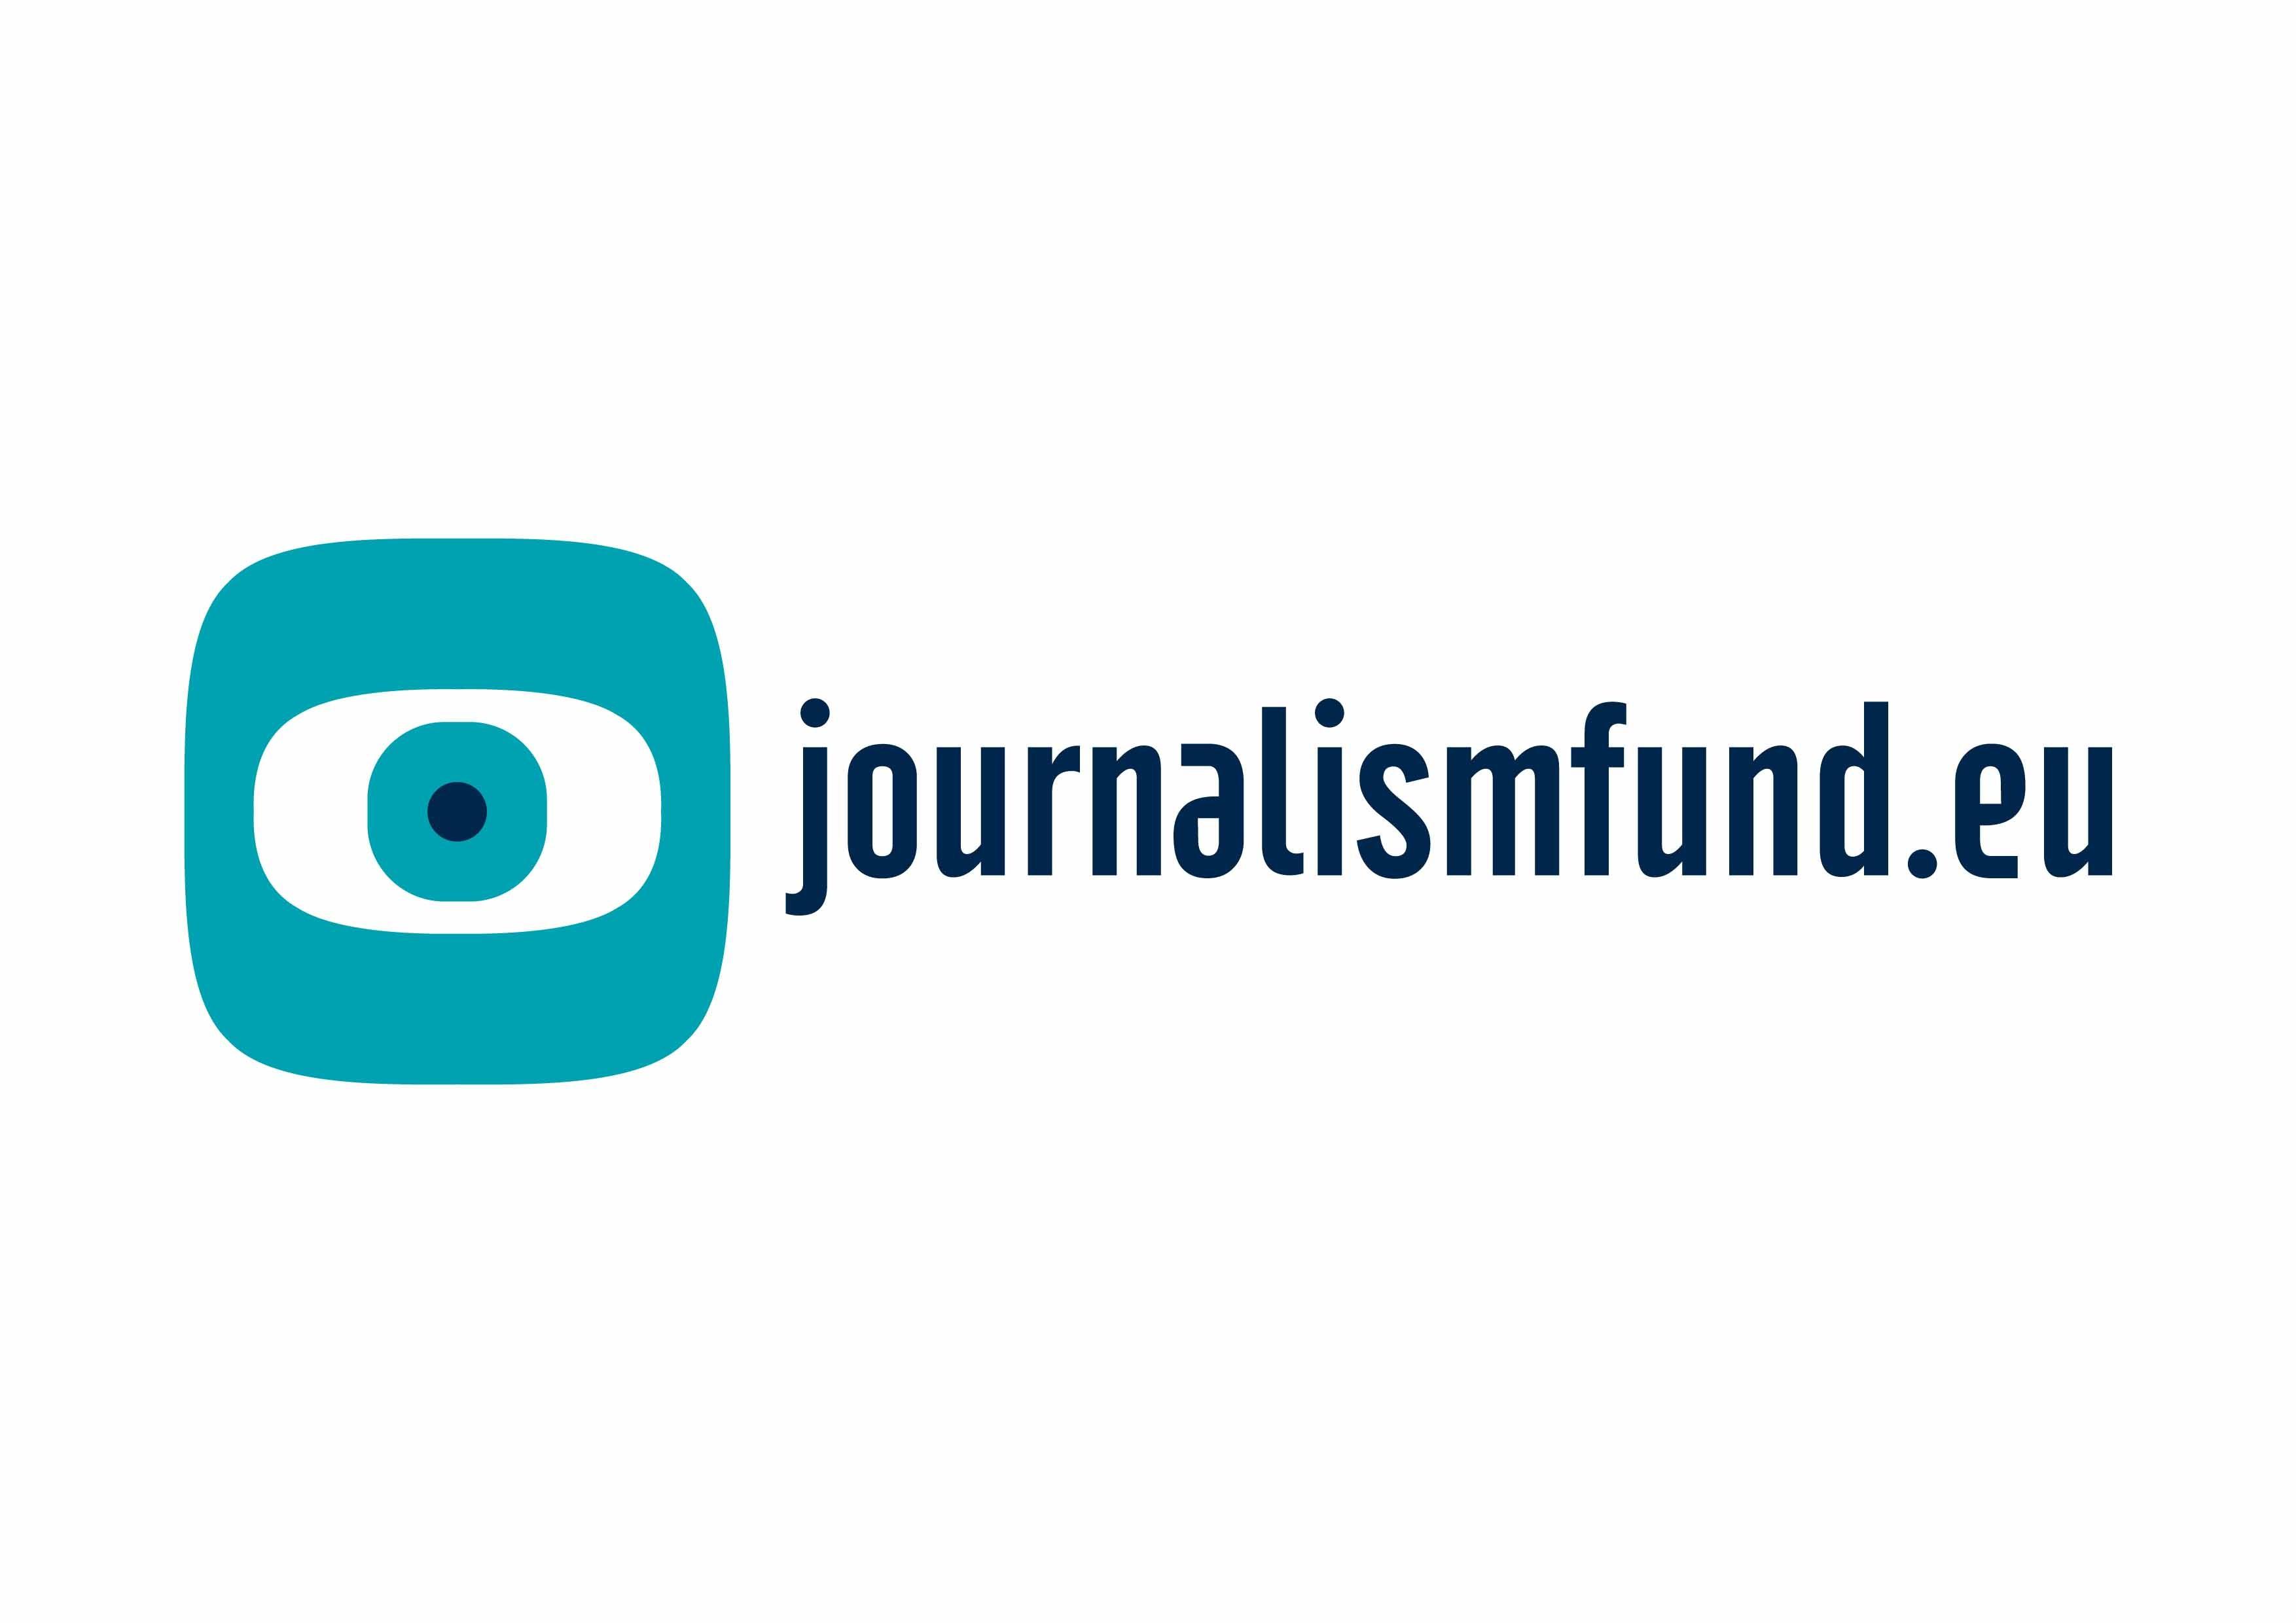 Journalismfund.eu | LinkedIn